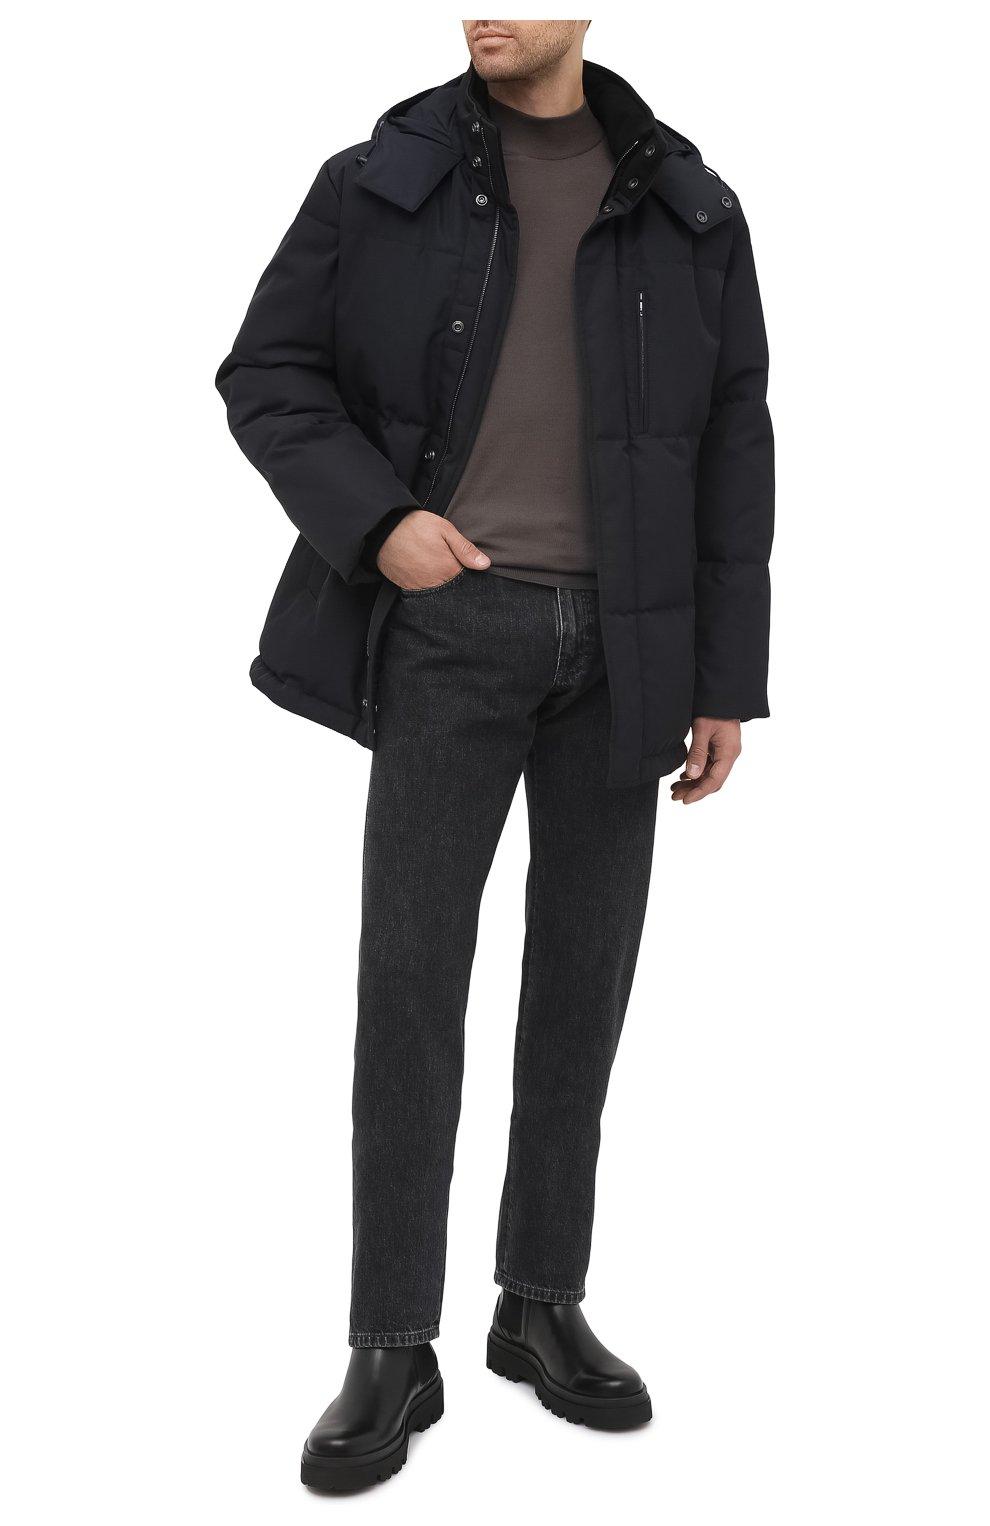 Мужская пуховик BRIONI темно-синего цвета, арт. SUNL0L/03811 | Фото 2 (Кросс-КТ: Куртка, Пуховик; Мужское Кросс-КТ: пуховик-короткий, Пуховик-верхняя одежда, Верхняя одежда; Рукава: Длинные; Длина (верхняя одежда): До середины бедра; Материал внешний: Синтетический материал; Материал подклада: Синтетический материал; Материал утеплителя: Пух и перо; Стили: Кэжуэл)